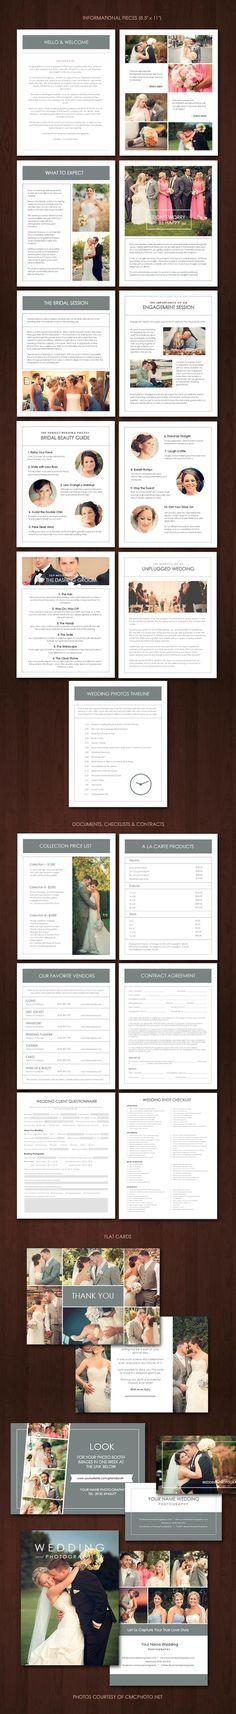 The Ultimate Wedding Photography Marketing Kit